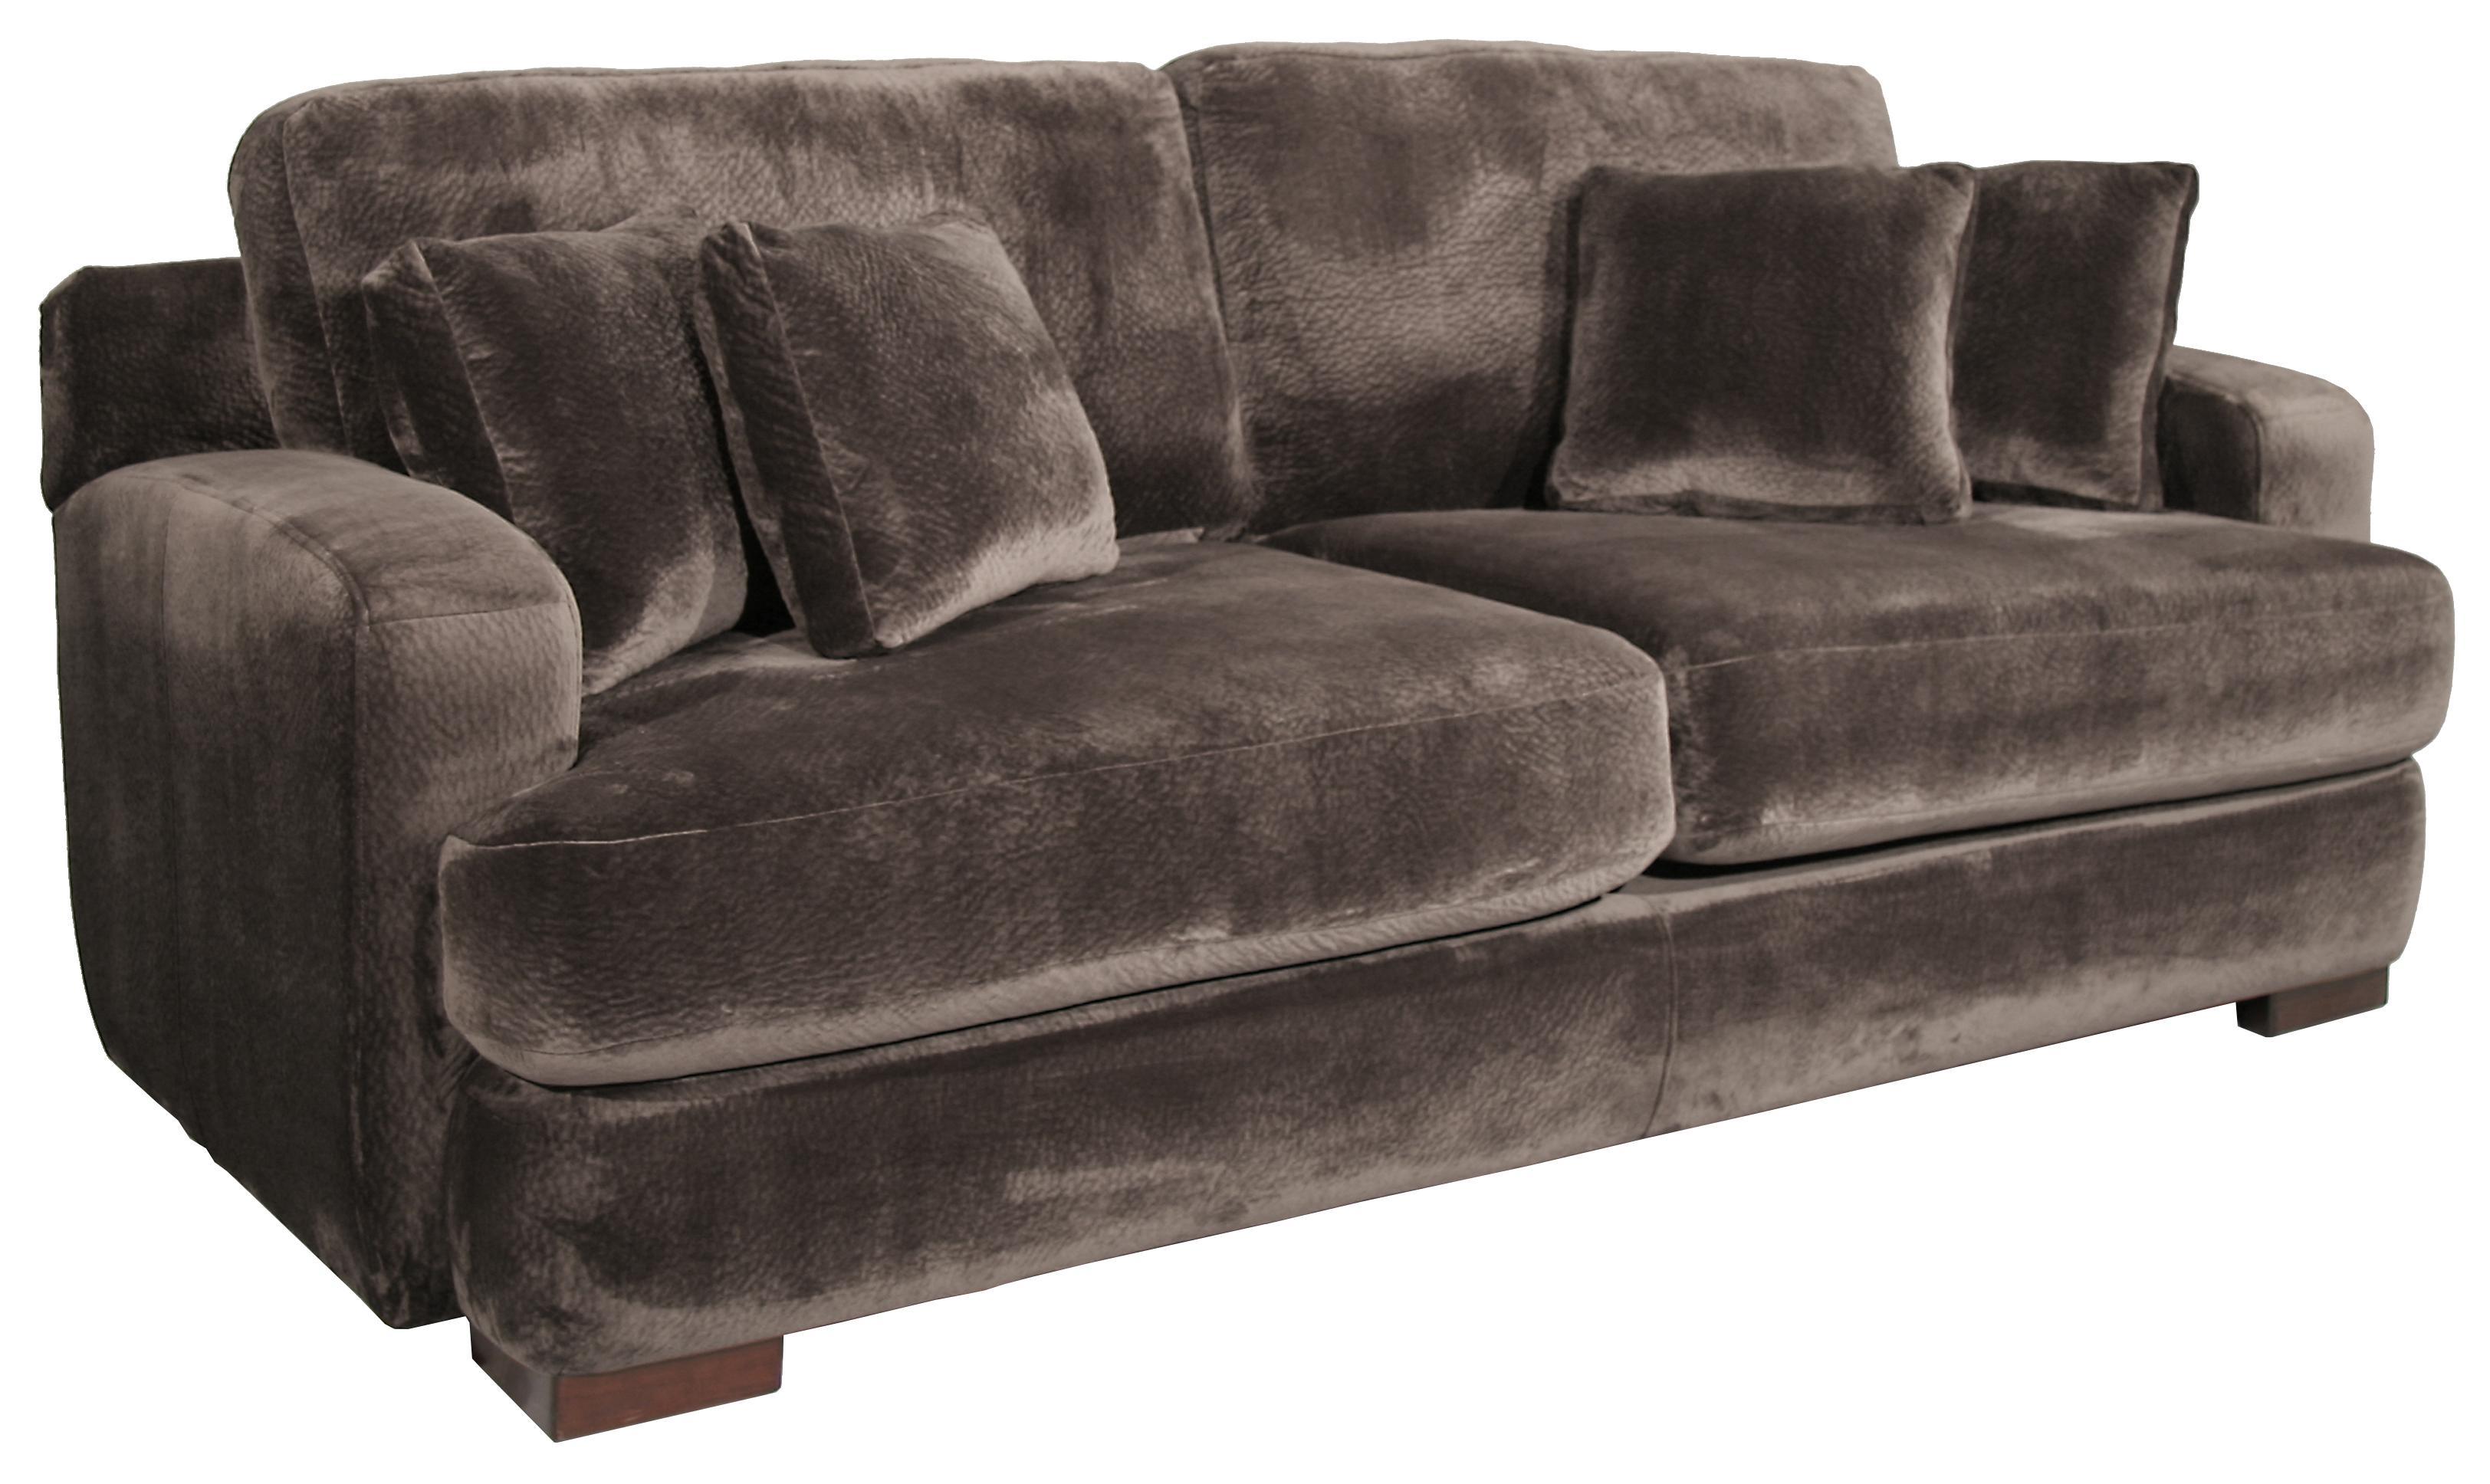 fairmont sofa table ralph lauren home jamaica designs riviera 668 comfortable sleeper with